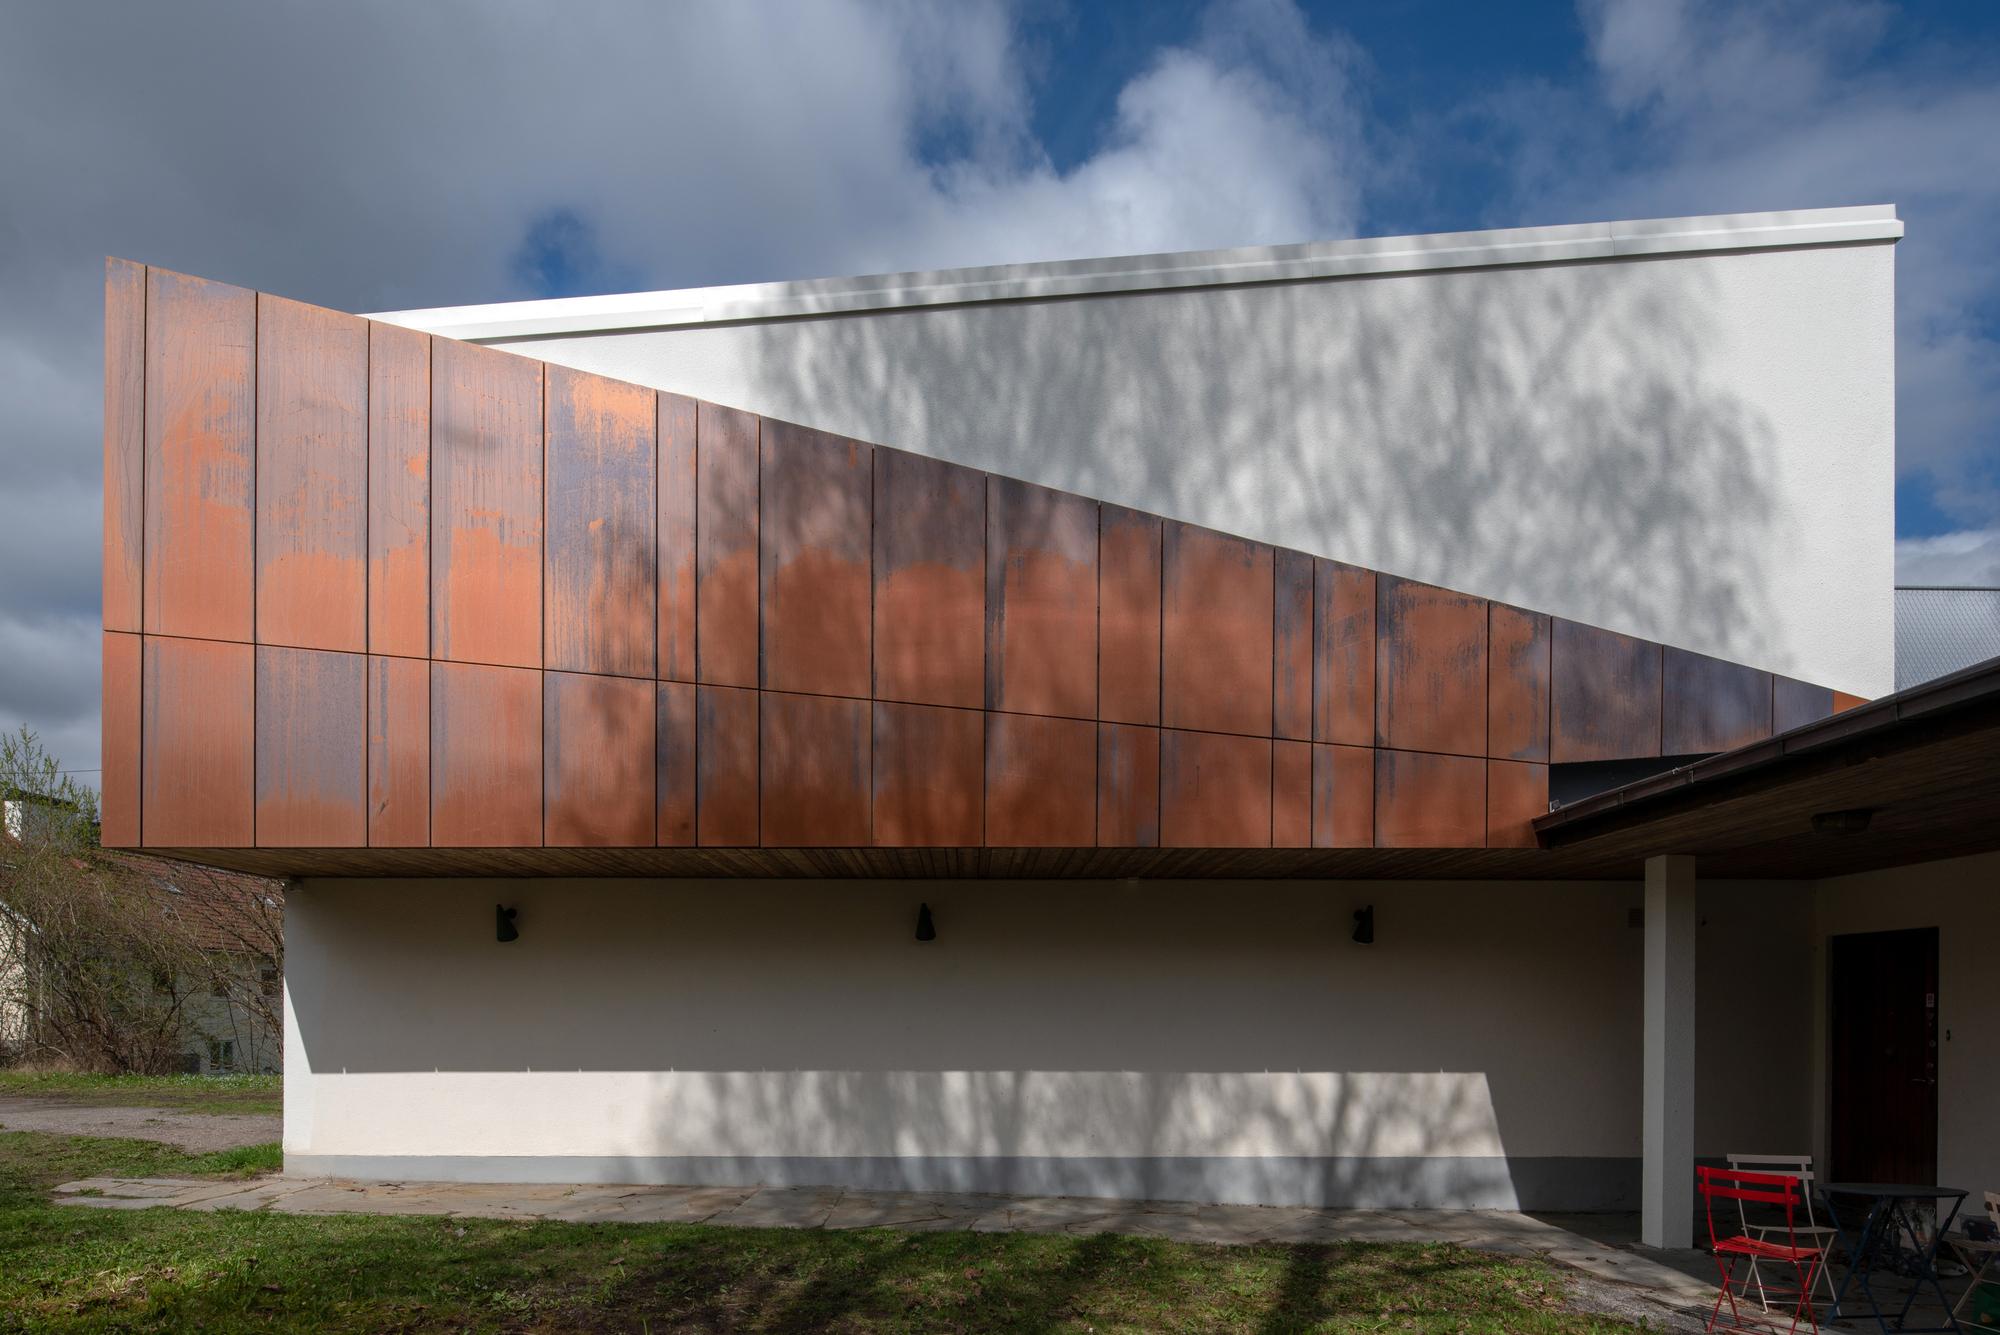 Architecte Le Mans cyclops house / mans tham arkitektkontor | archdaily